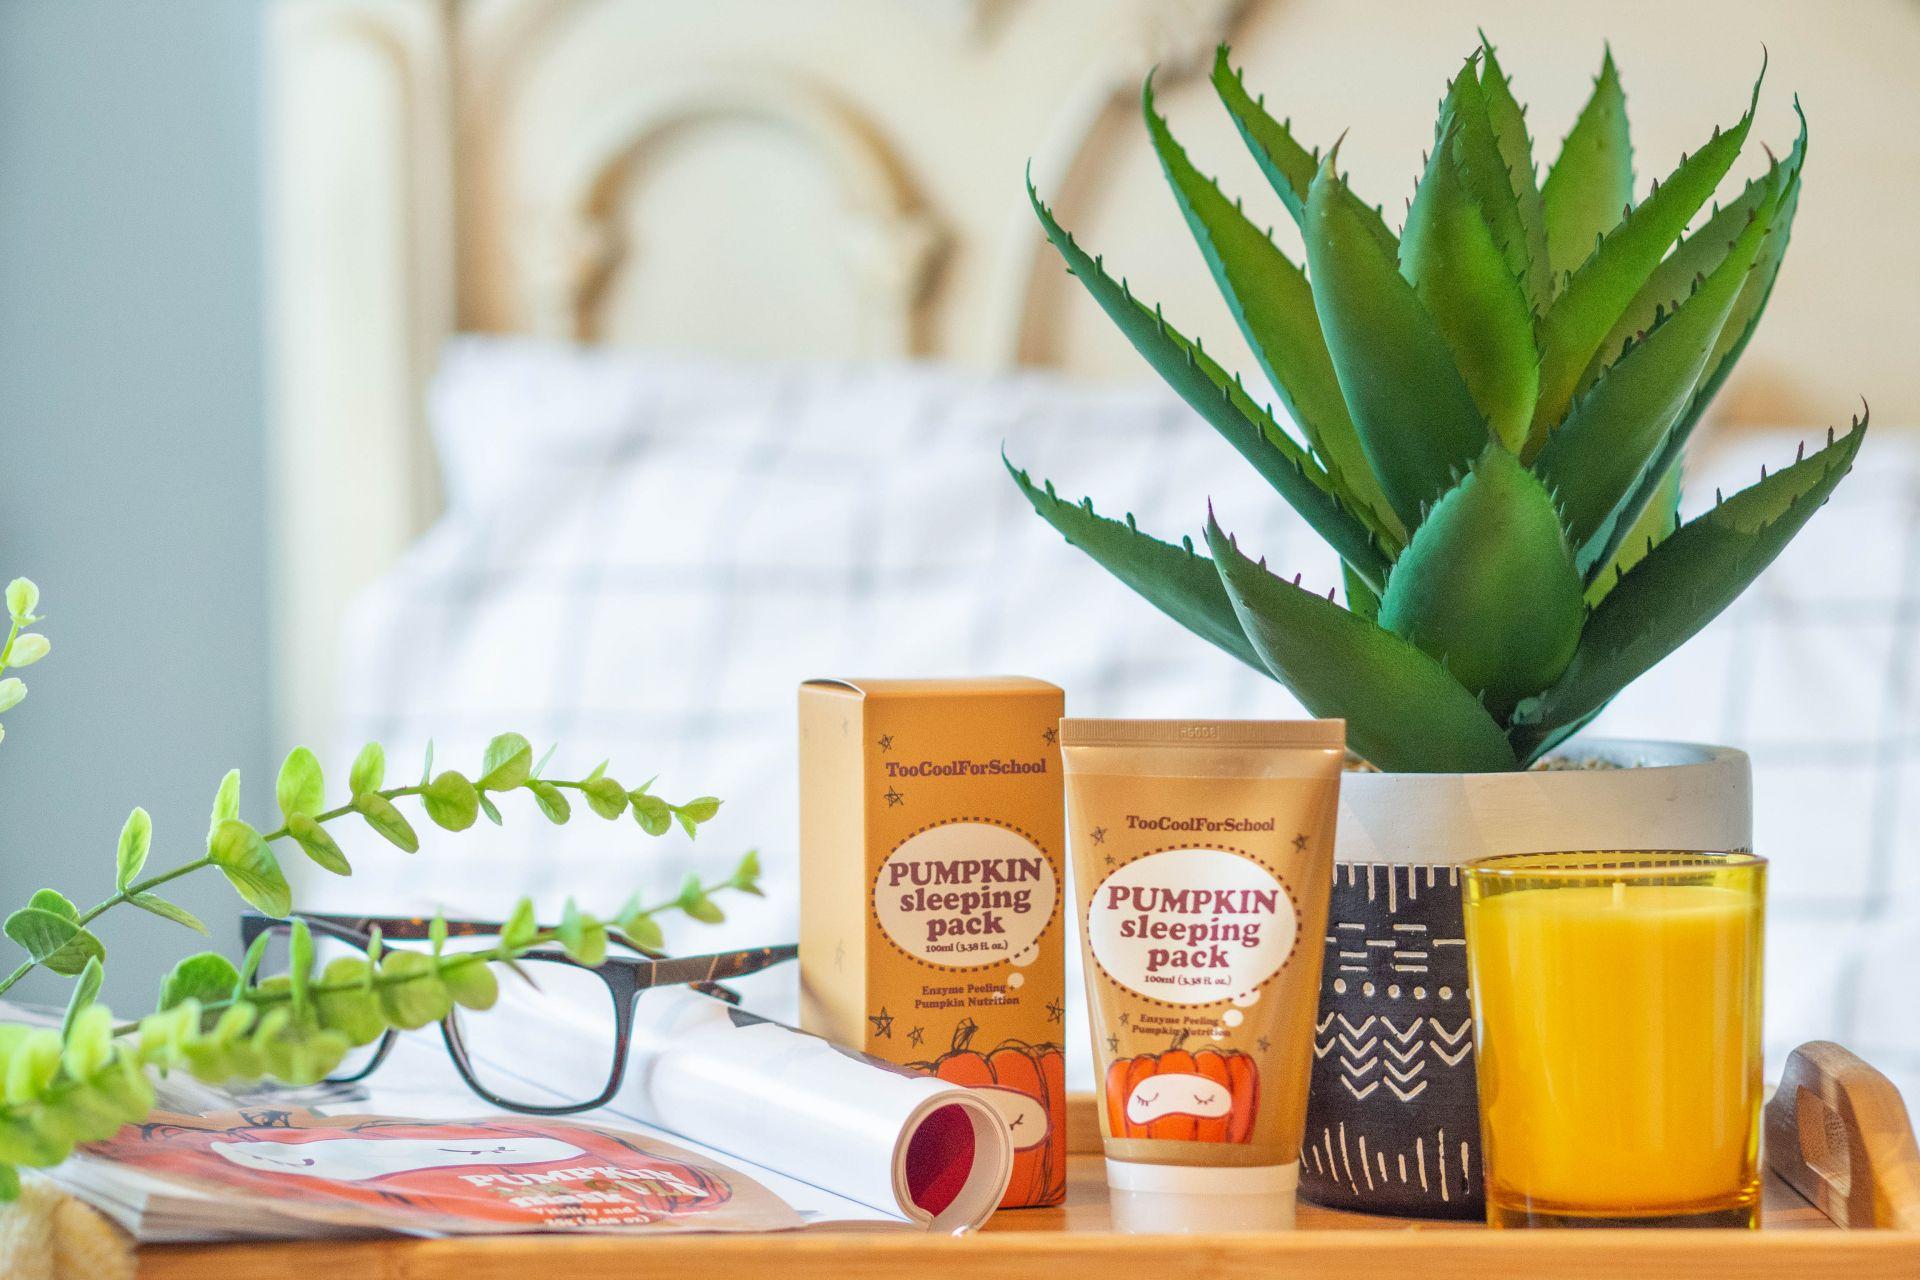 Pumpkin skincare review